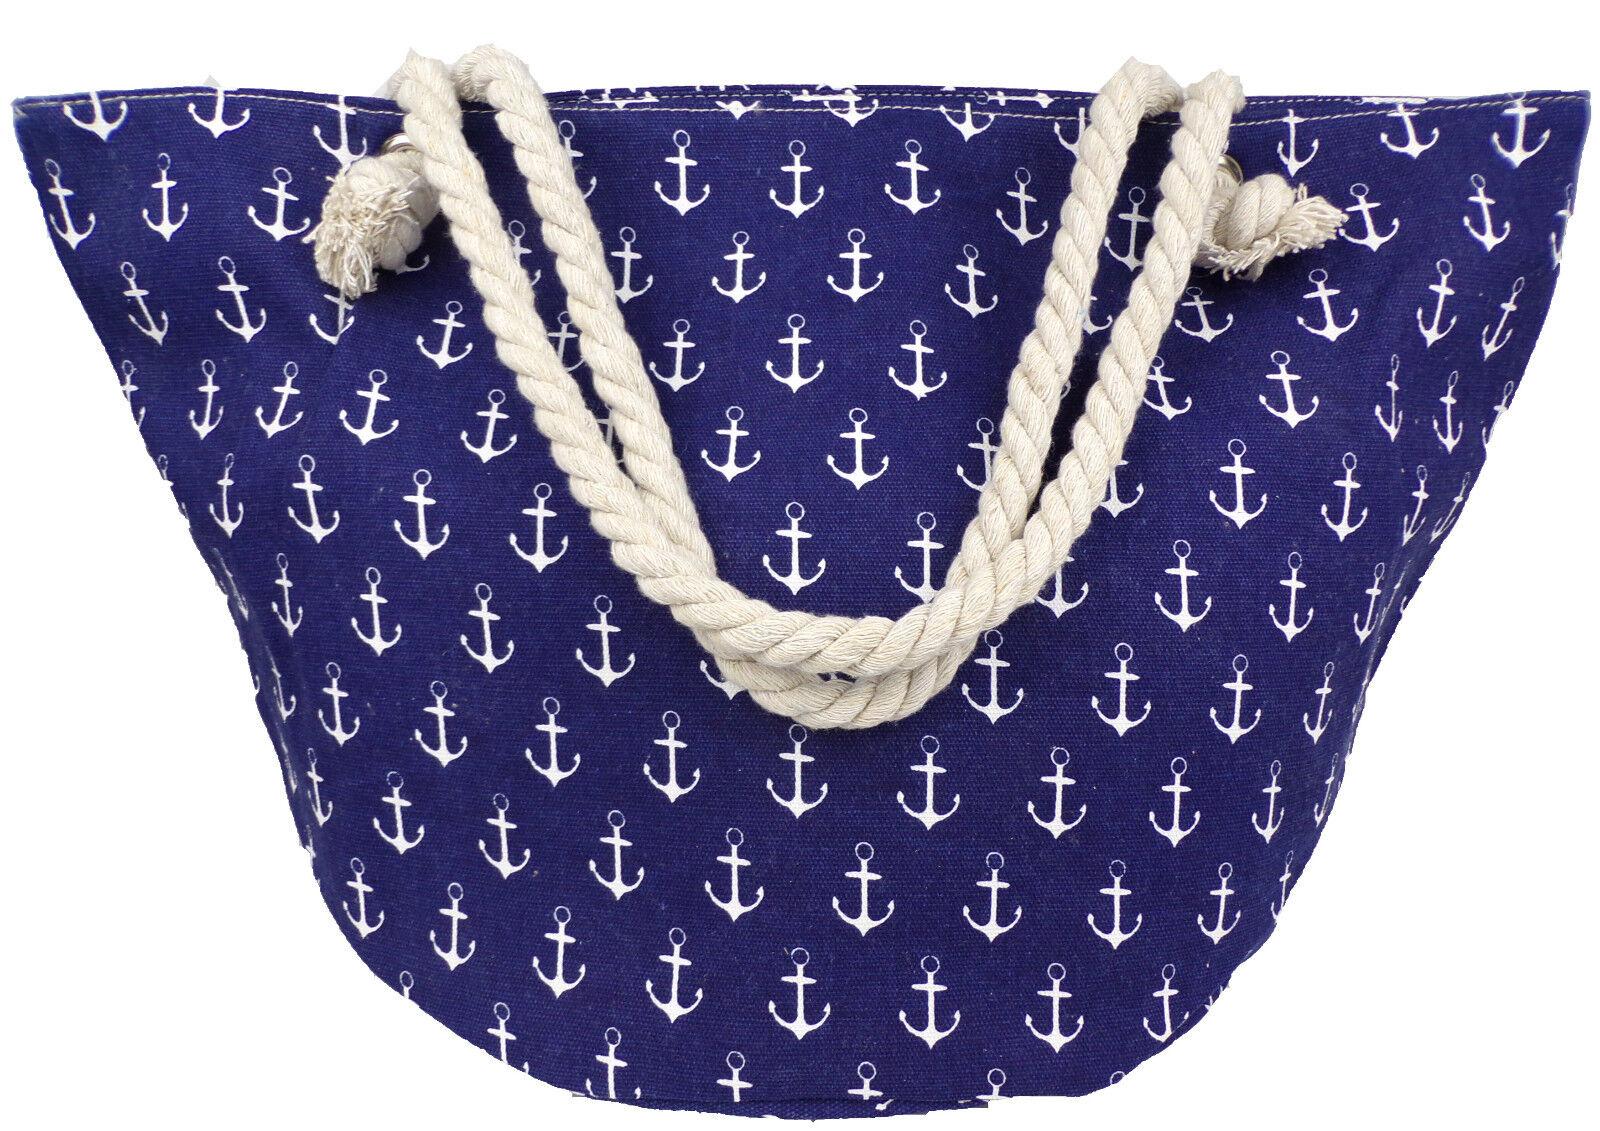 Damen Handtasche groß blau Textil Anker maritim Tragetasche Seil